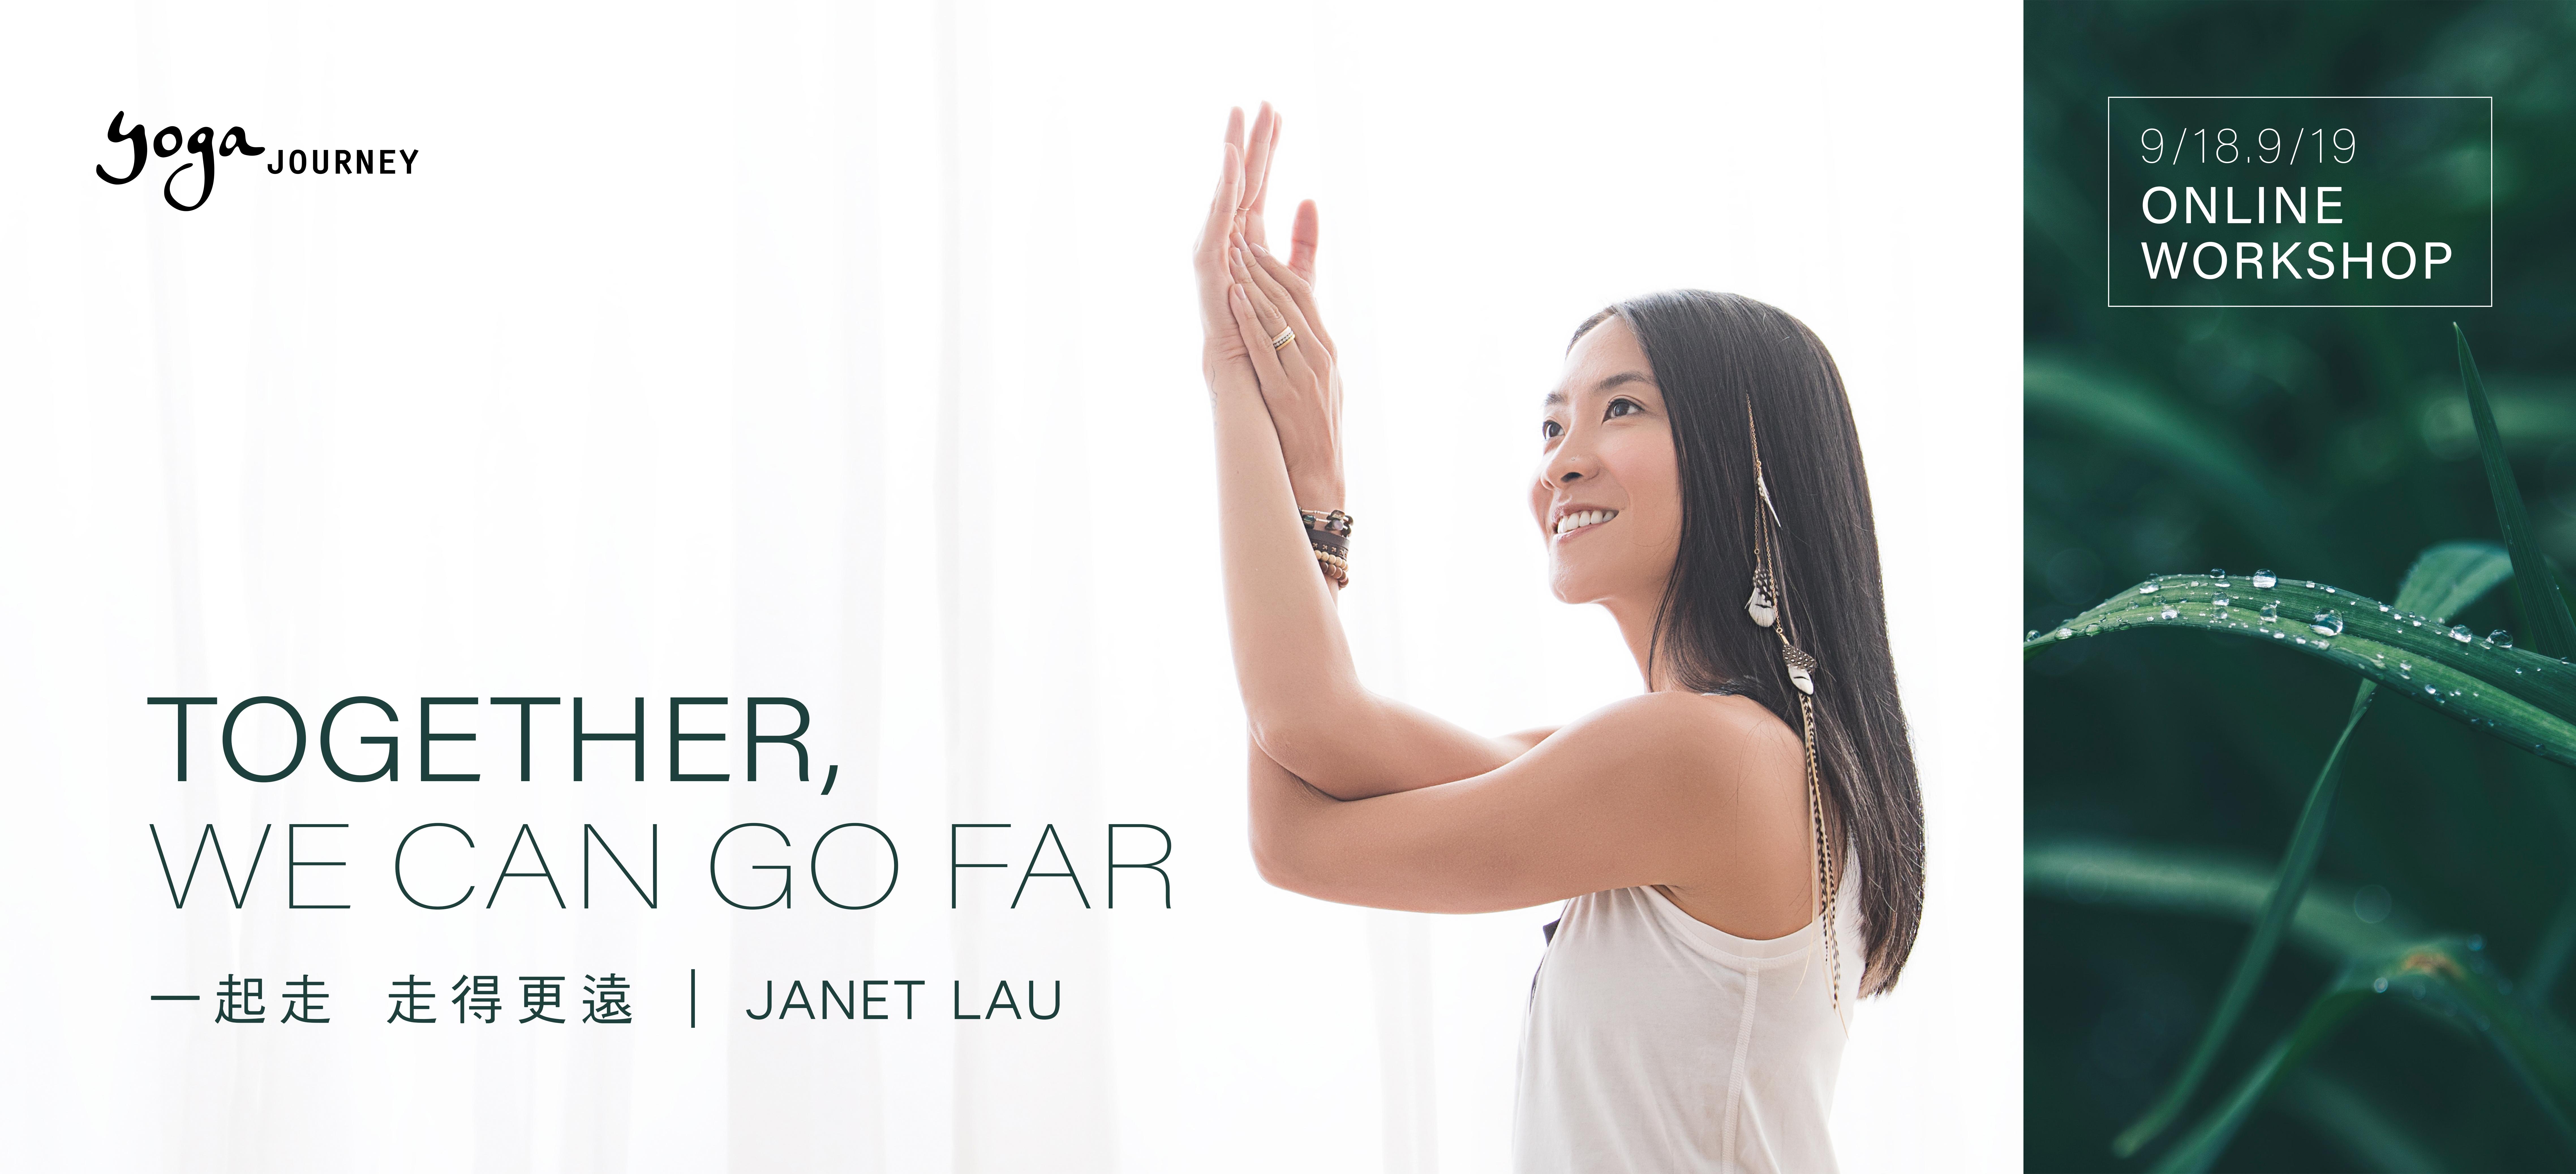 janet_lau_瑜珈_線上研習課